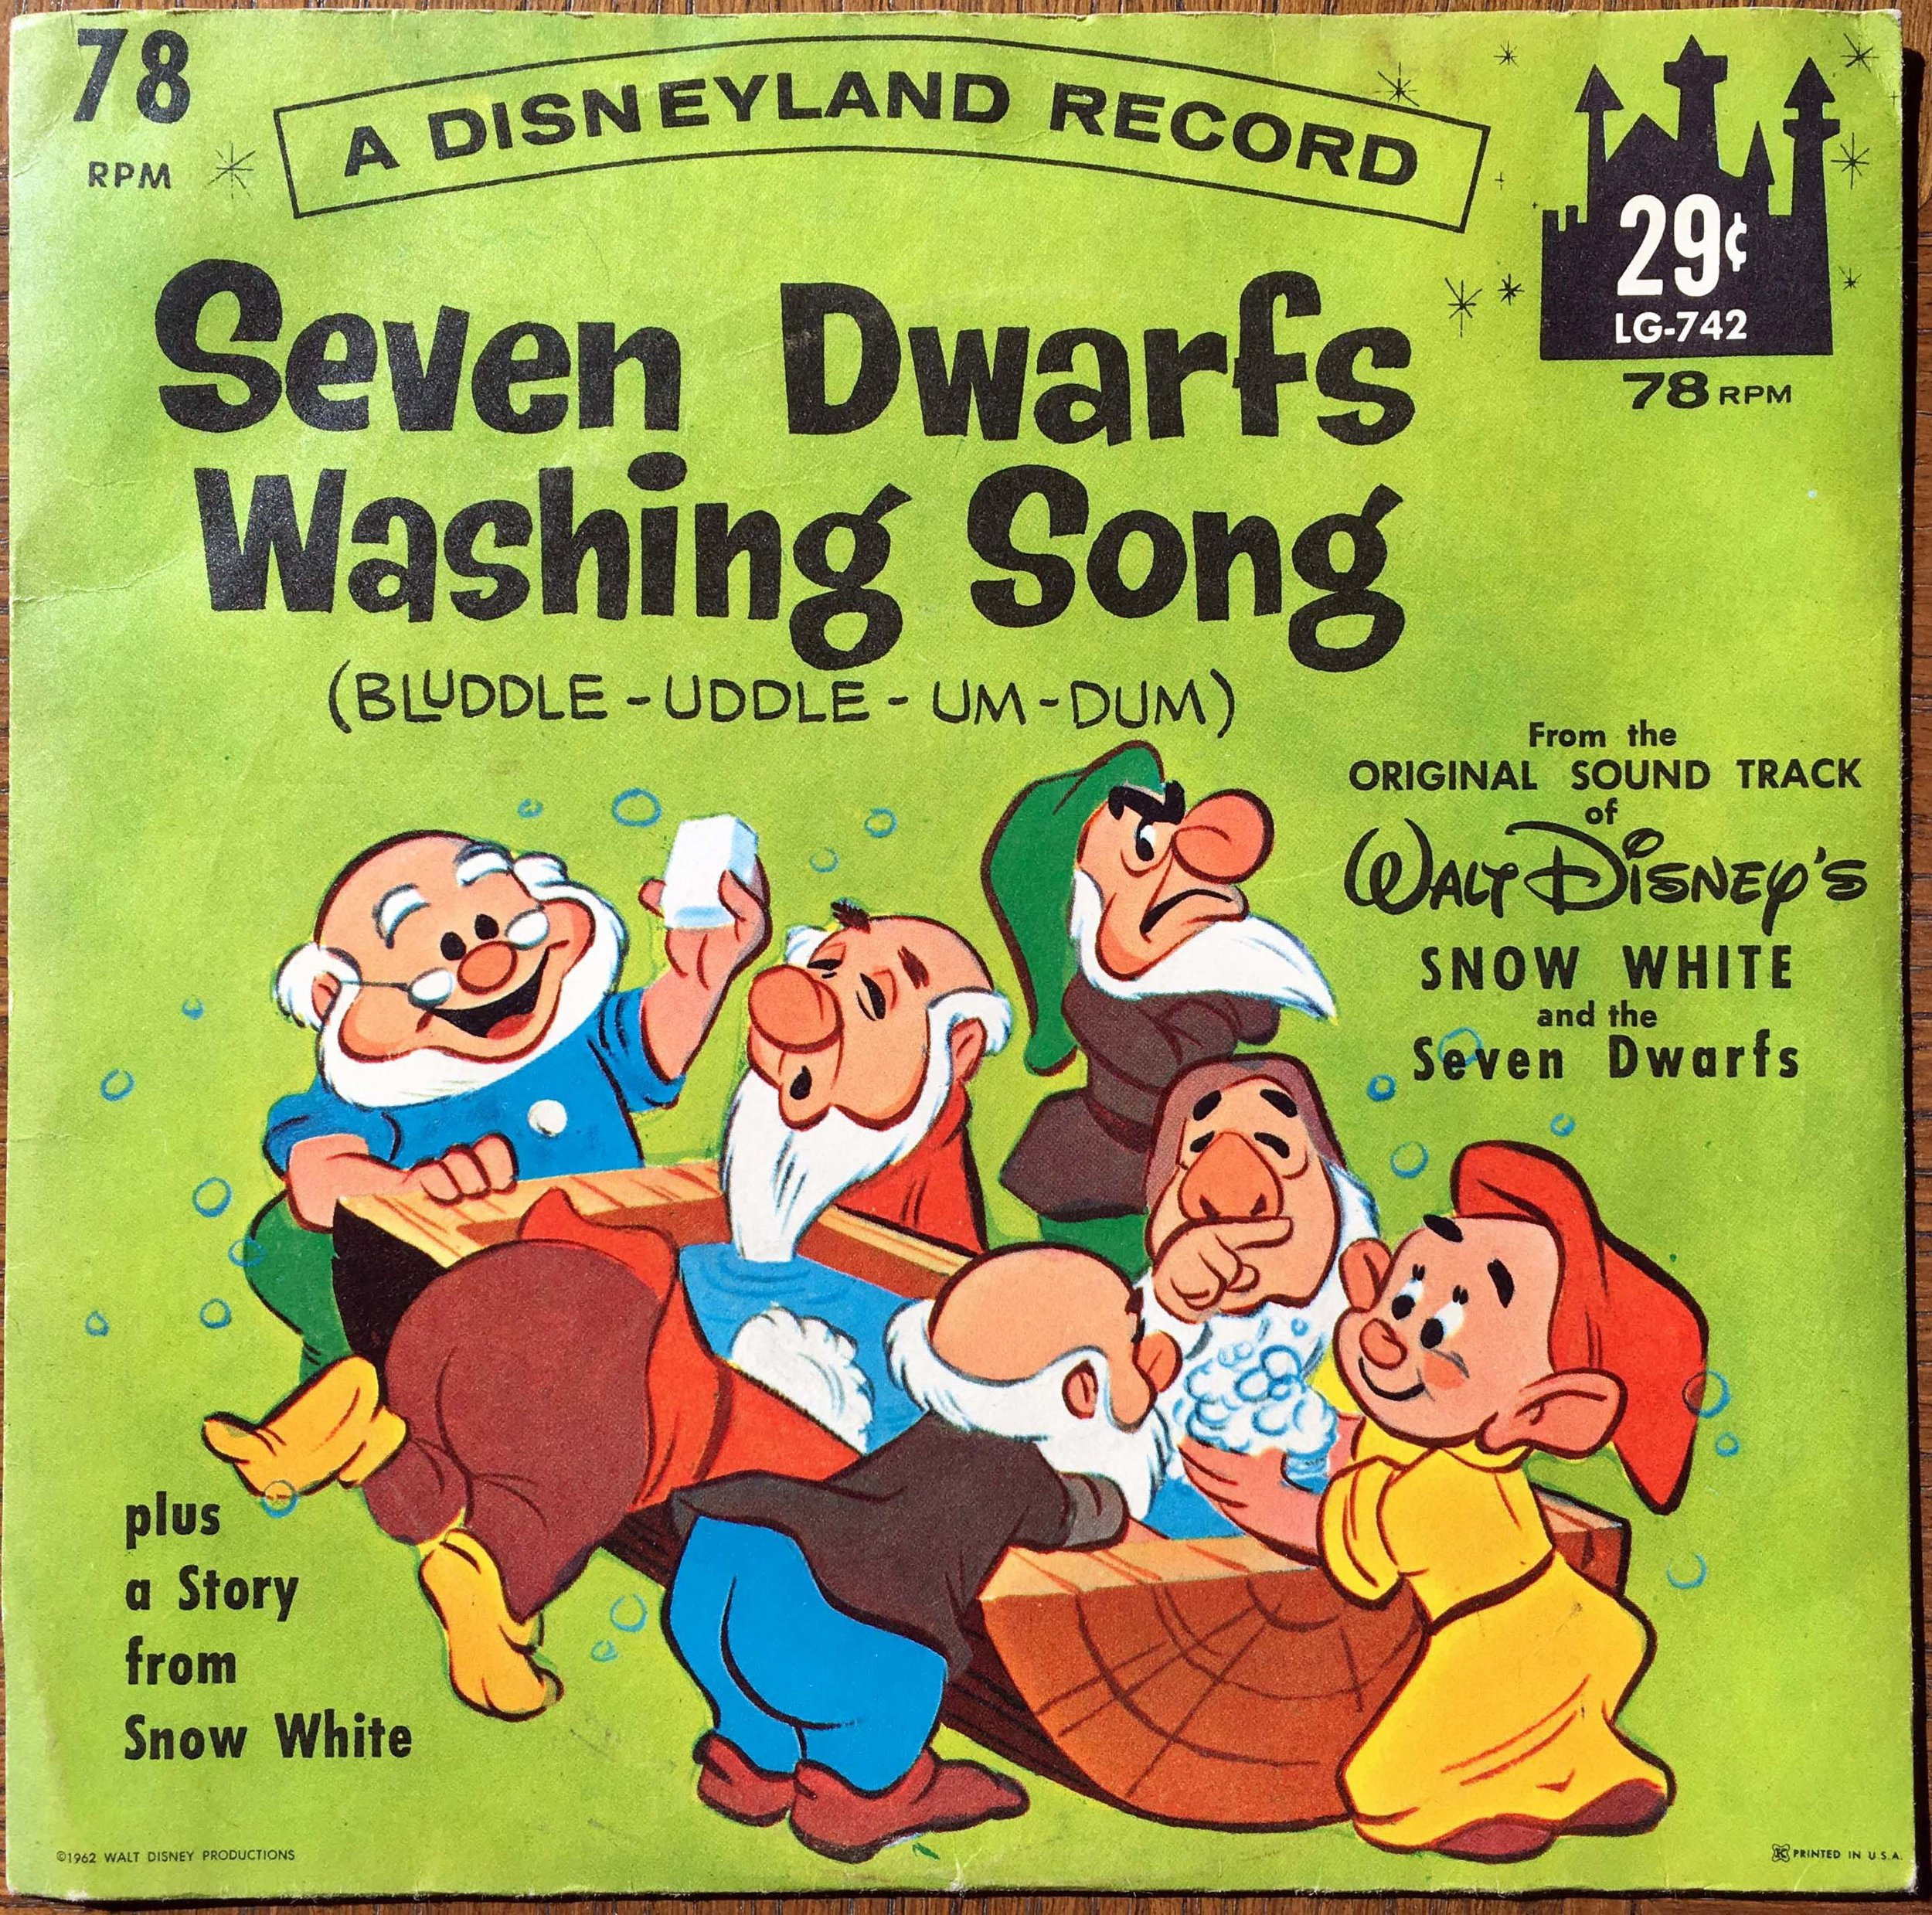 Seven Dwarfs Washing Song